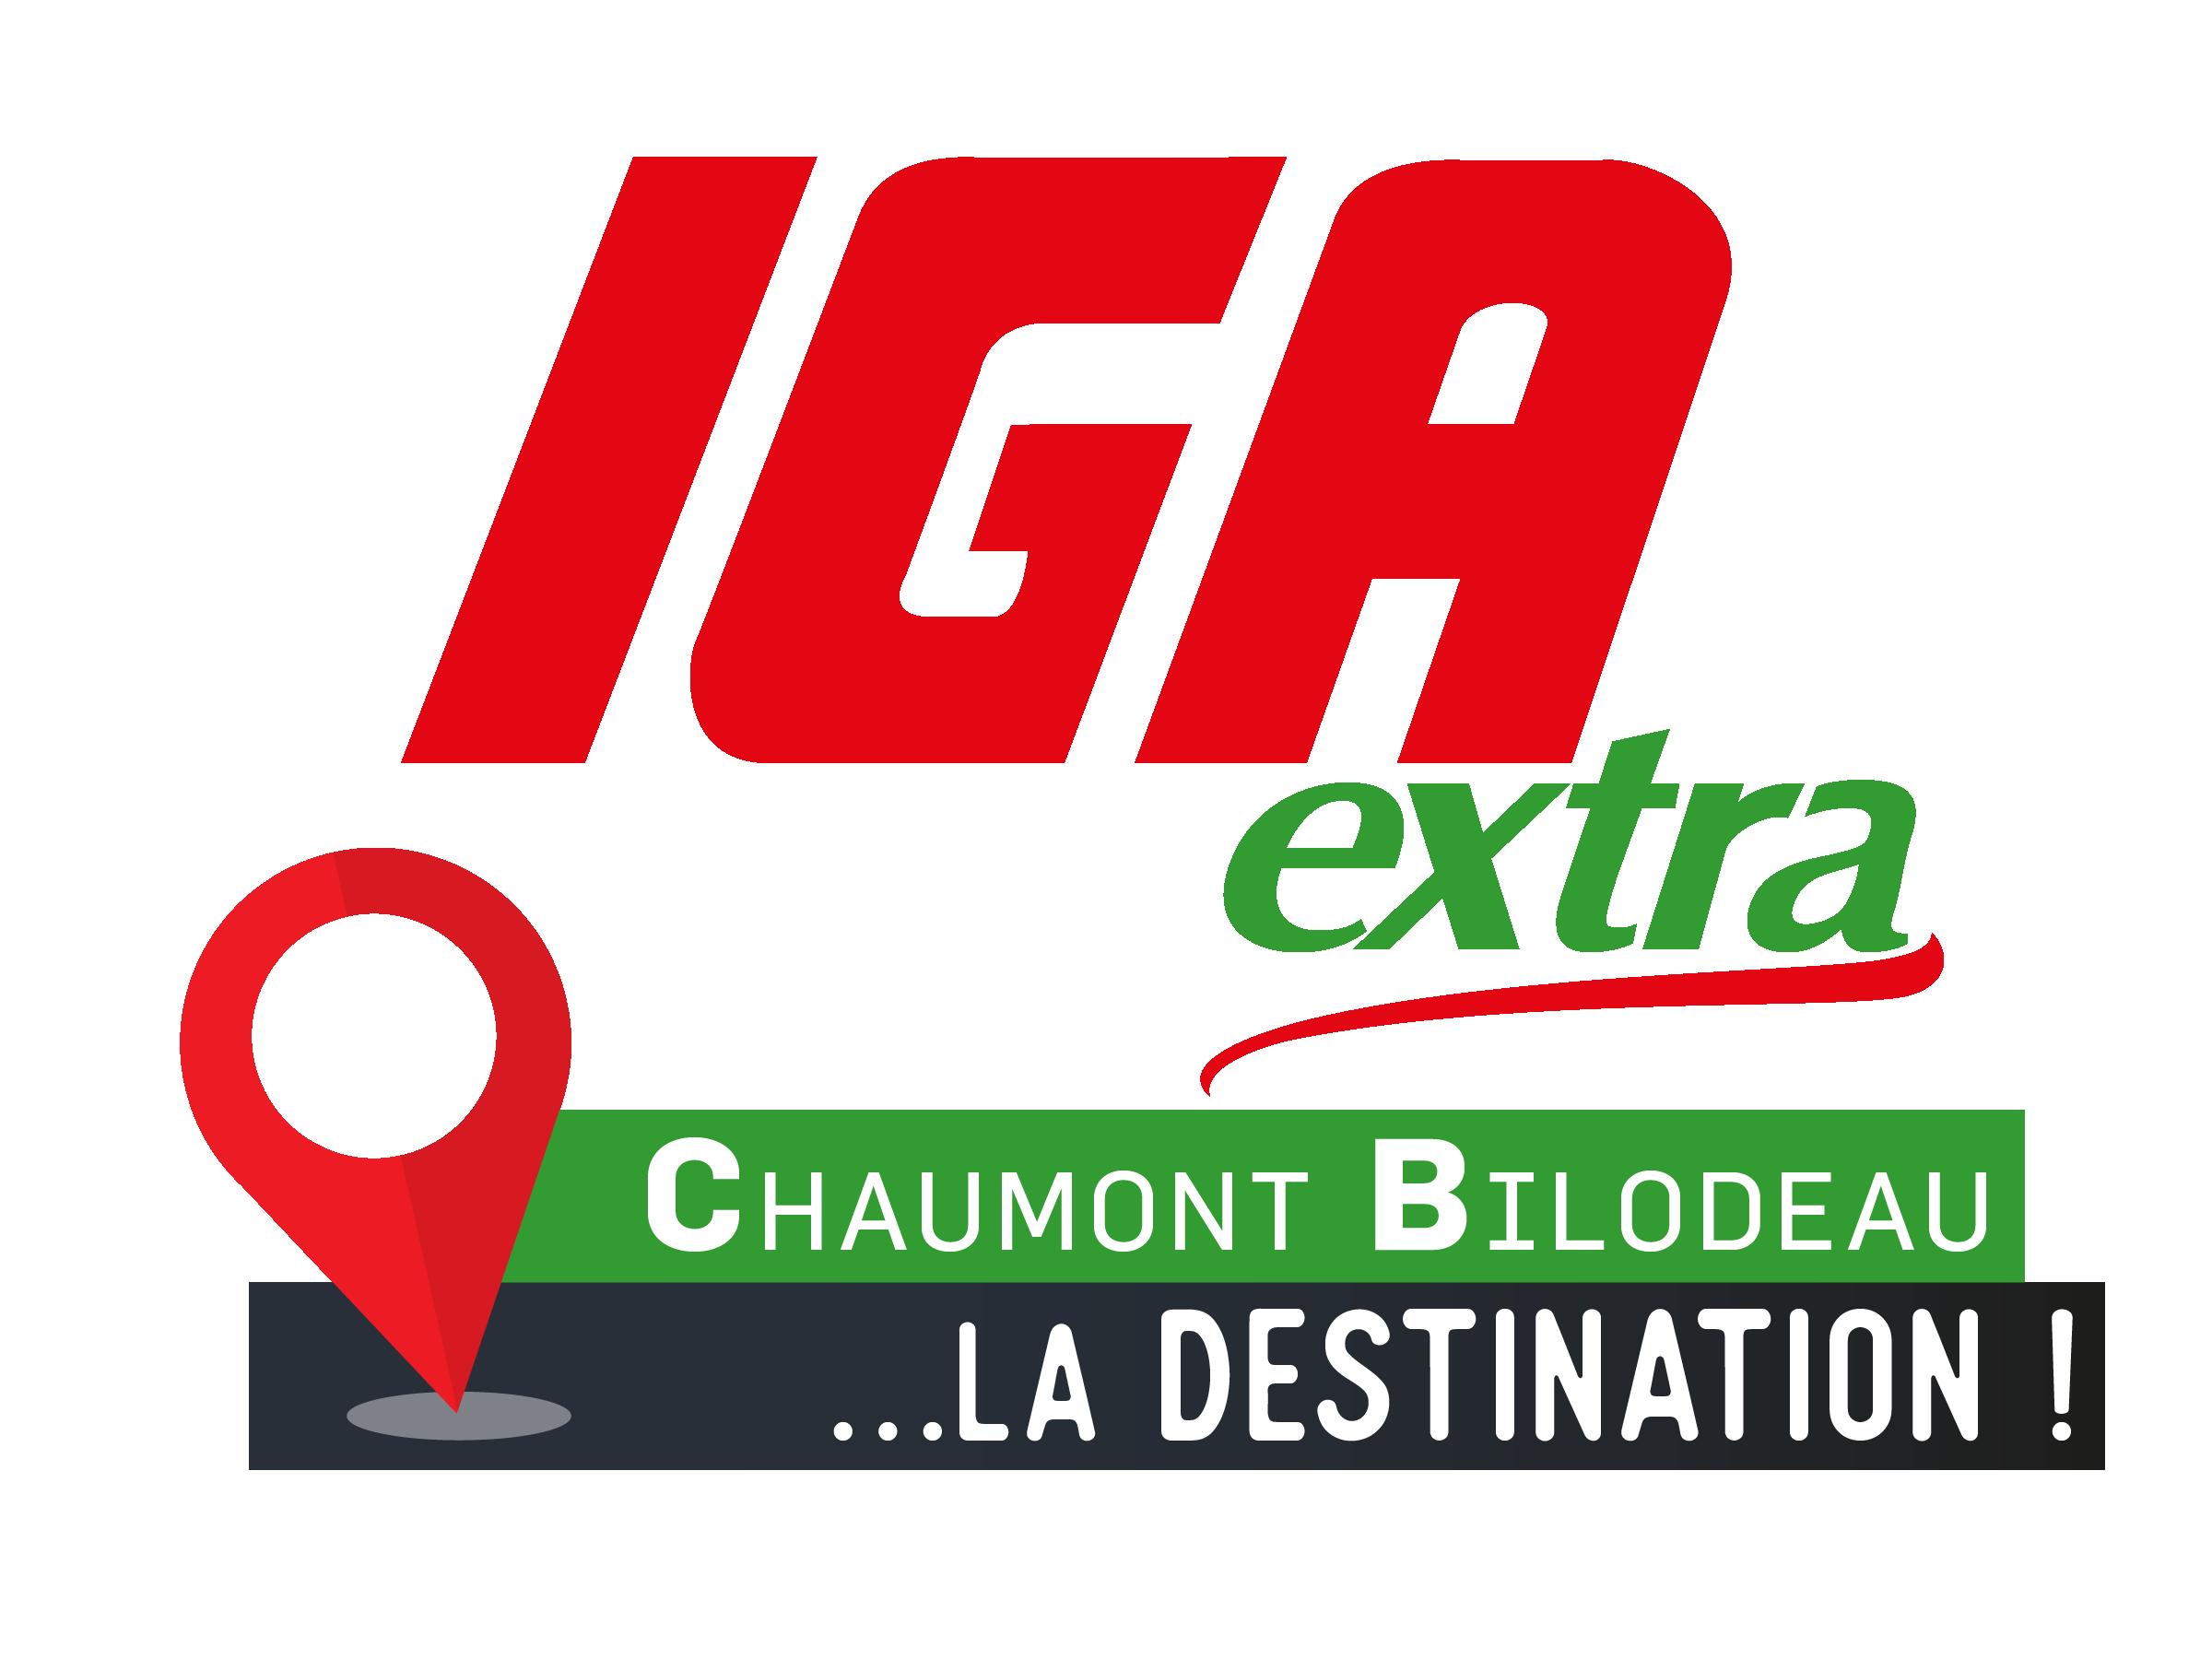 IGA Extra Chaumont Bilodeau